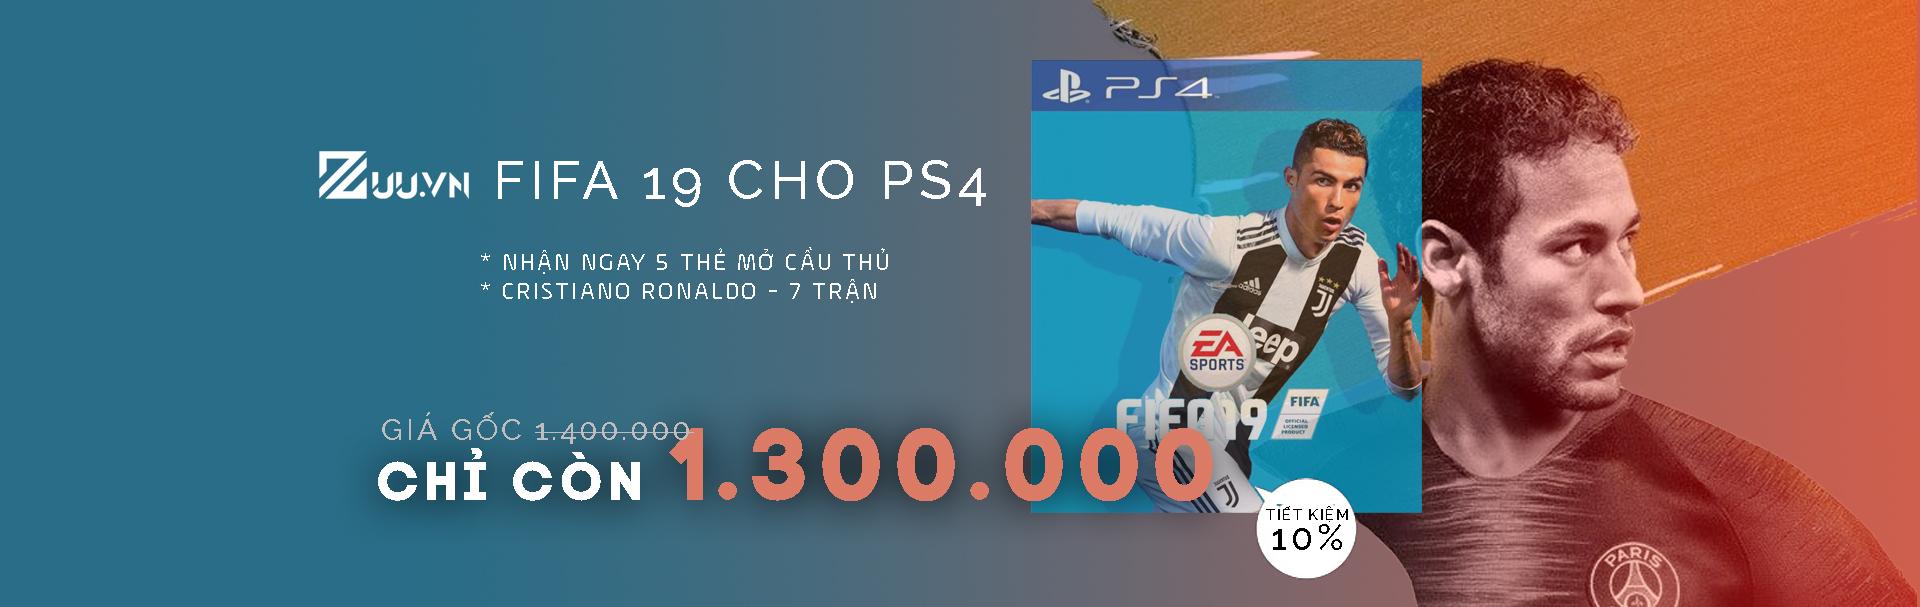 Đĩa game FIFA 19